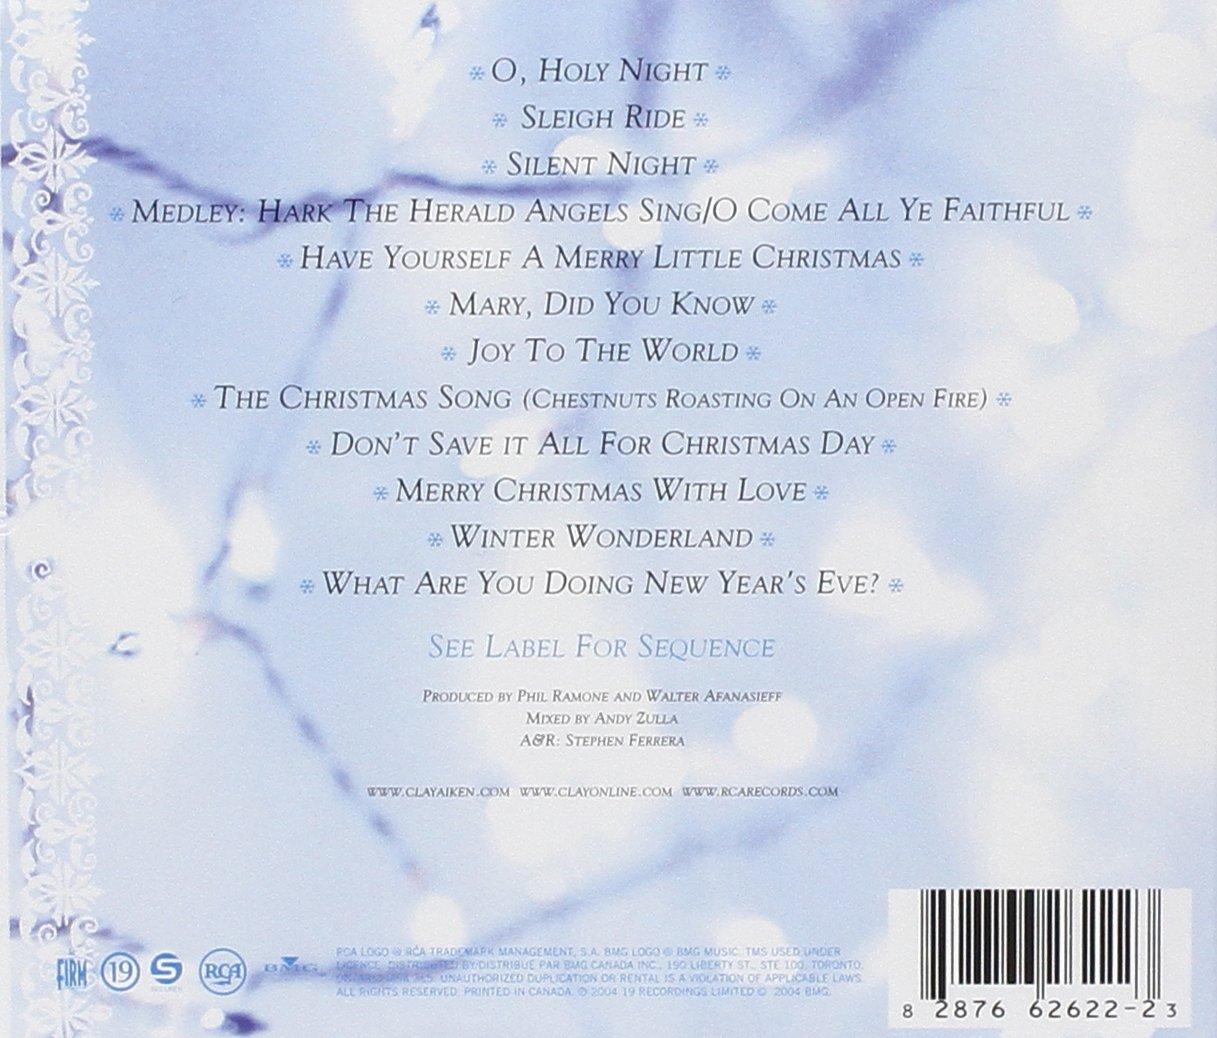 Clay Aiken - Merry Christmas With Love - Amazon.com Music